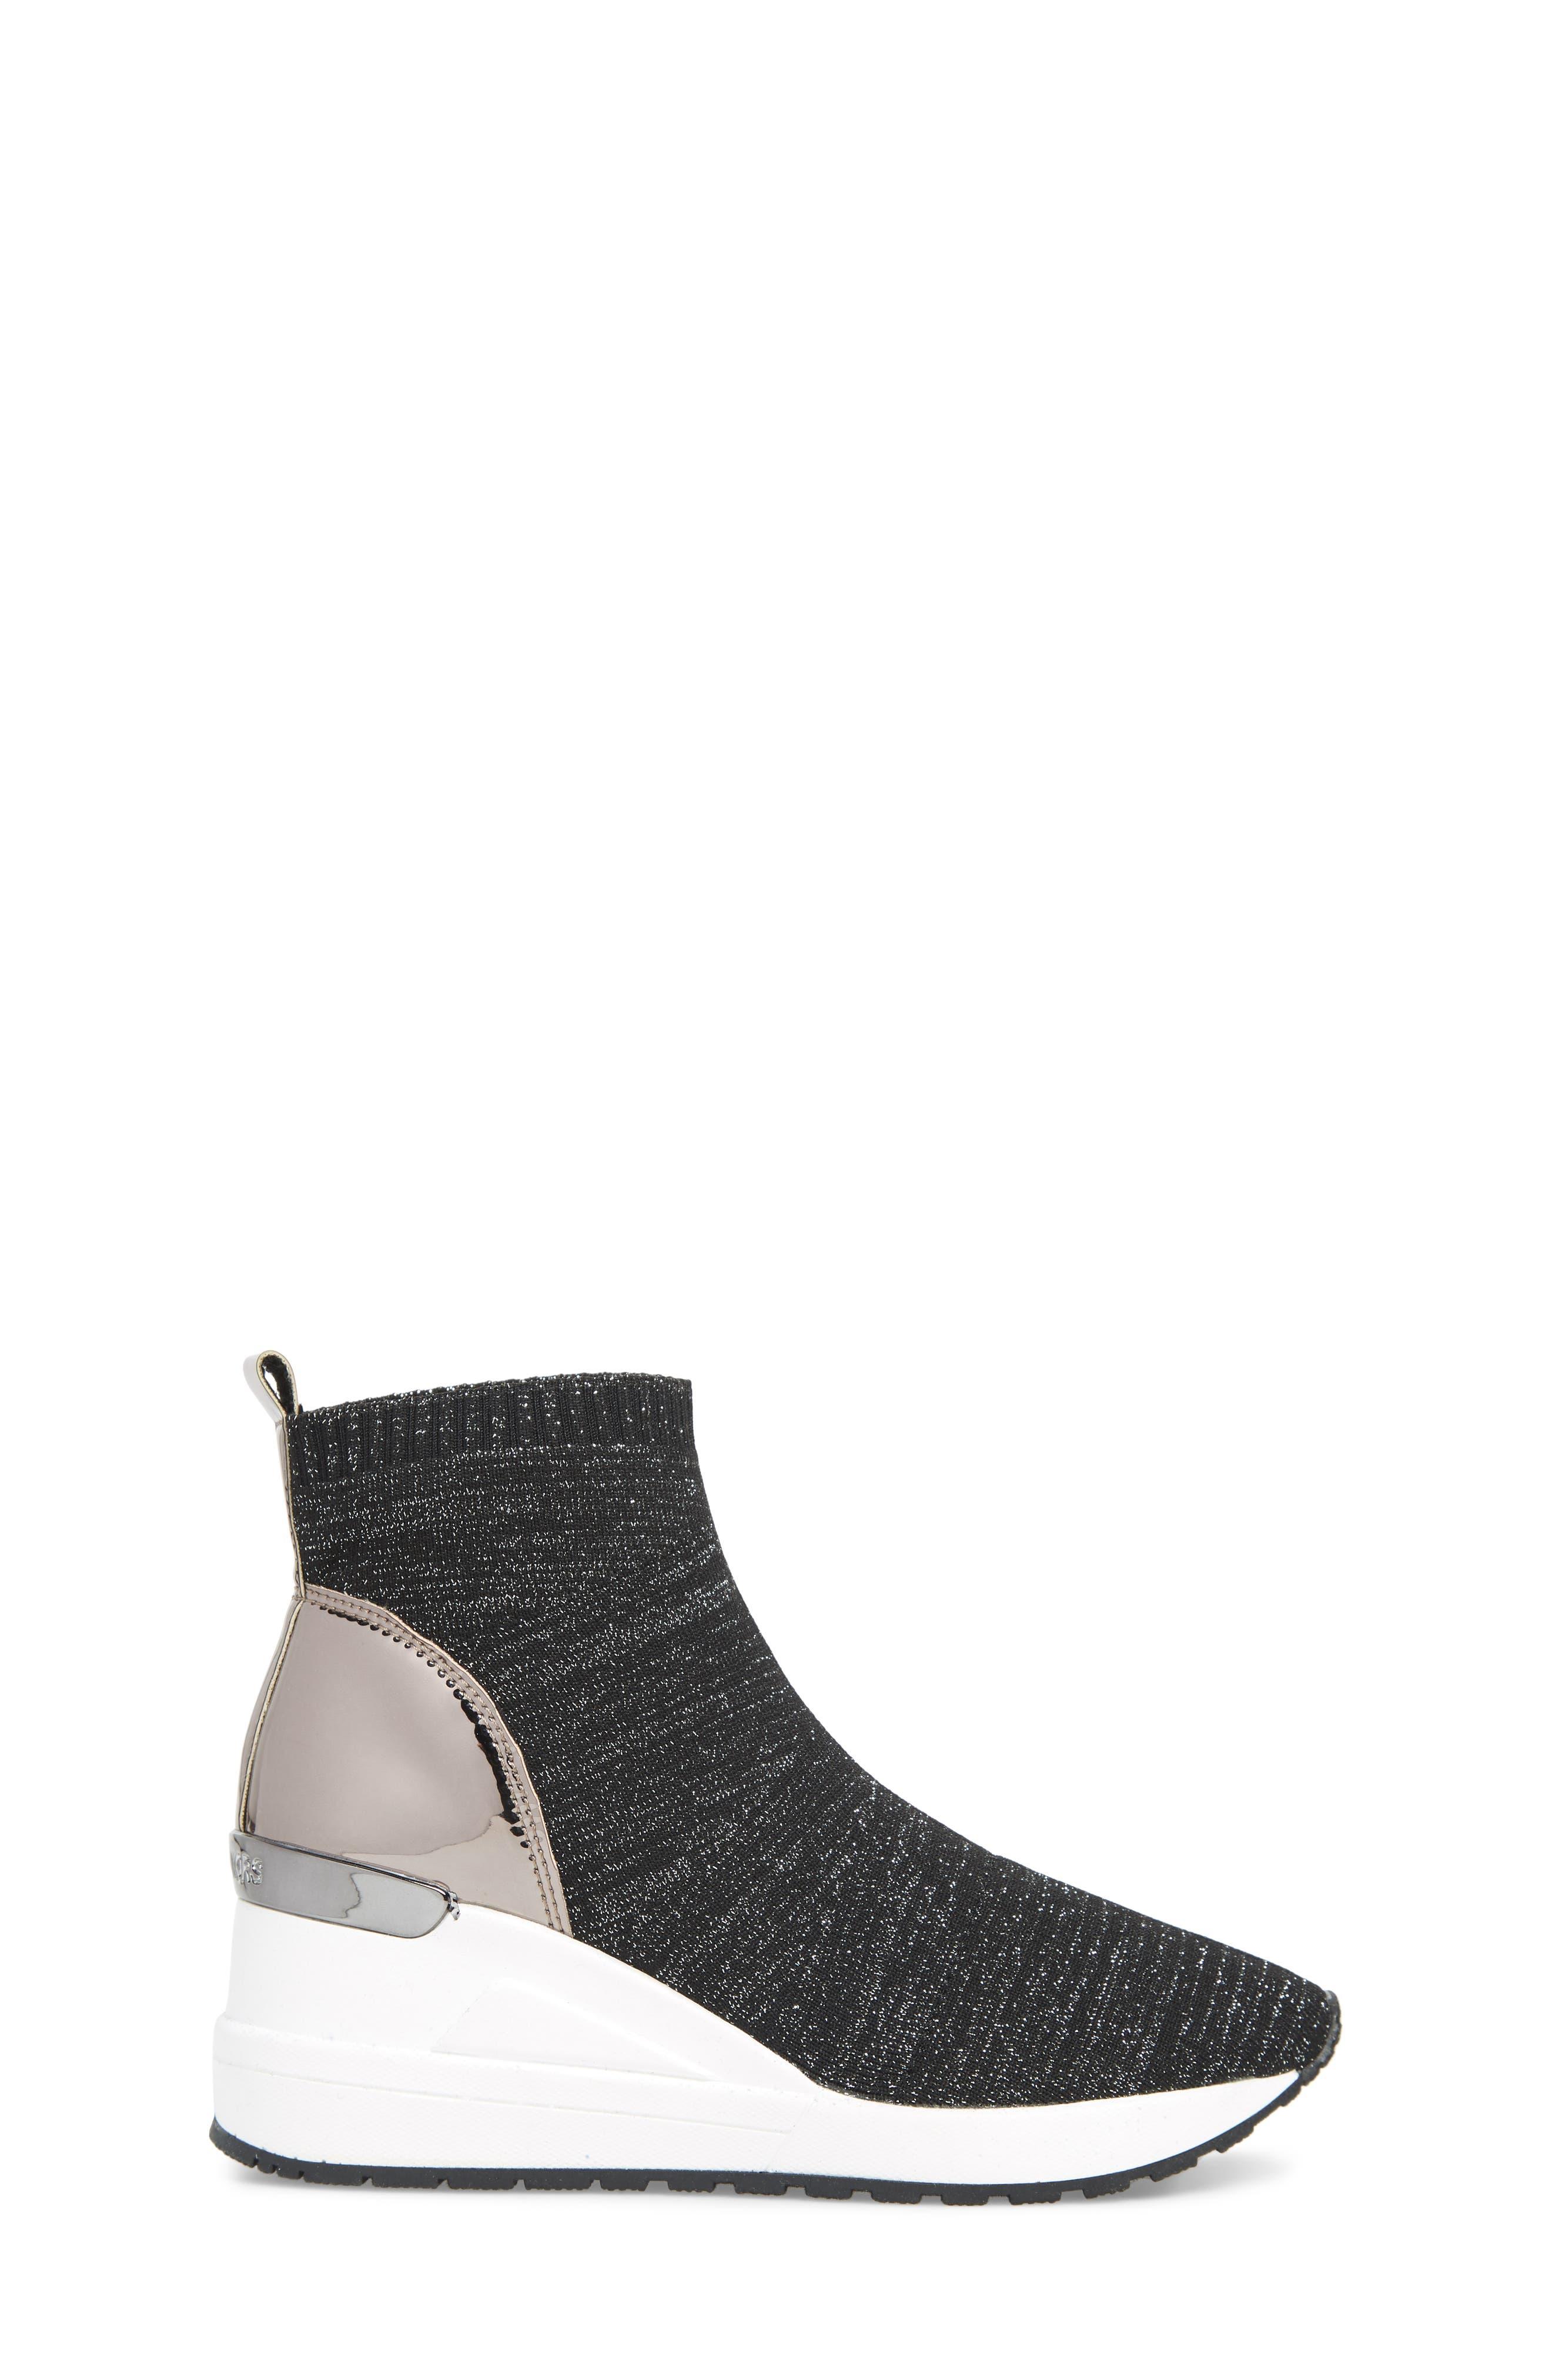 Neo Flex Metallic Wedge Sneaker,                             Alternate thumbnail 3, color,                             BLACK METALLIC